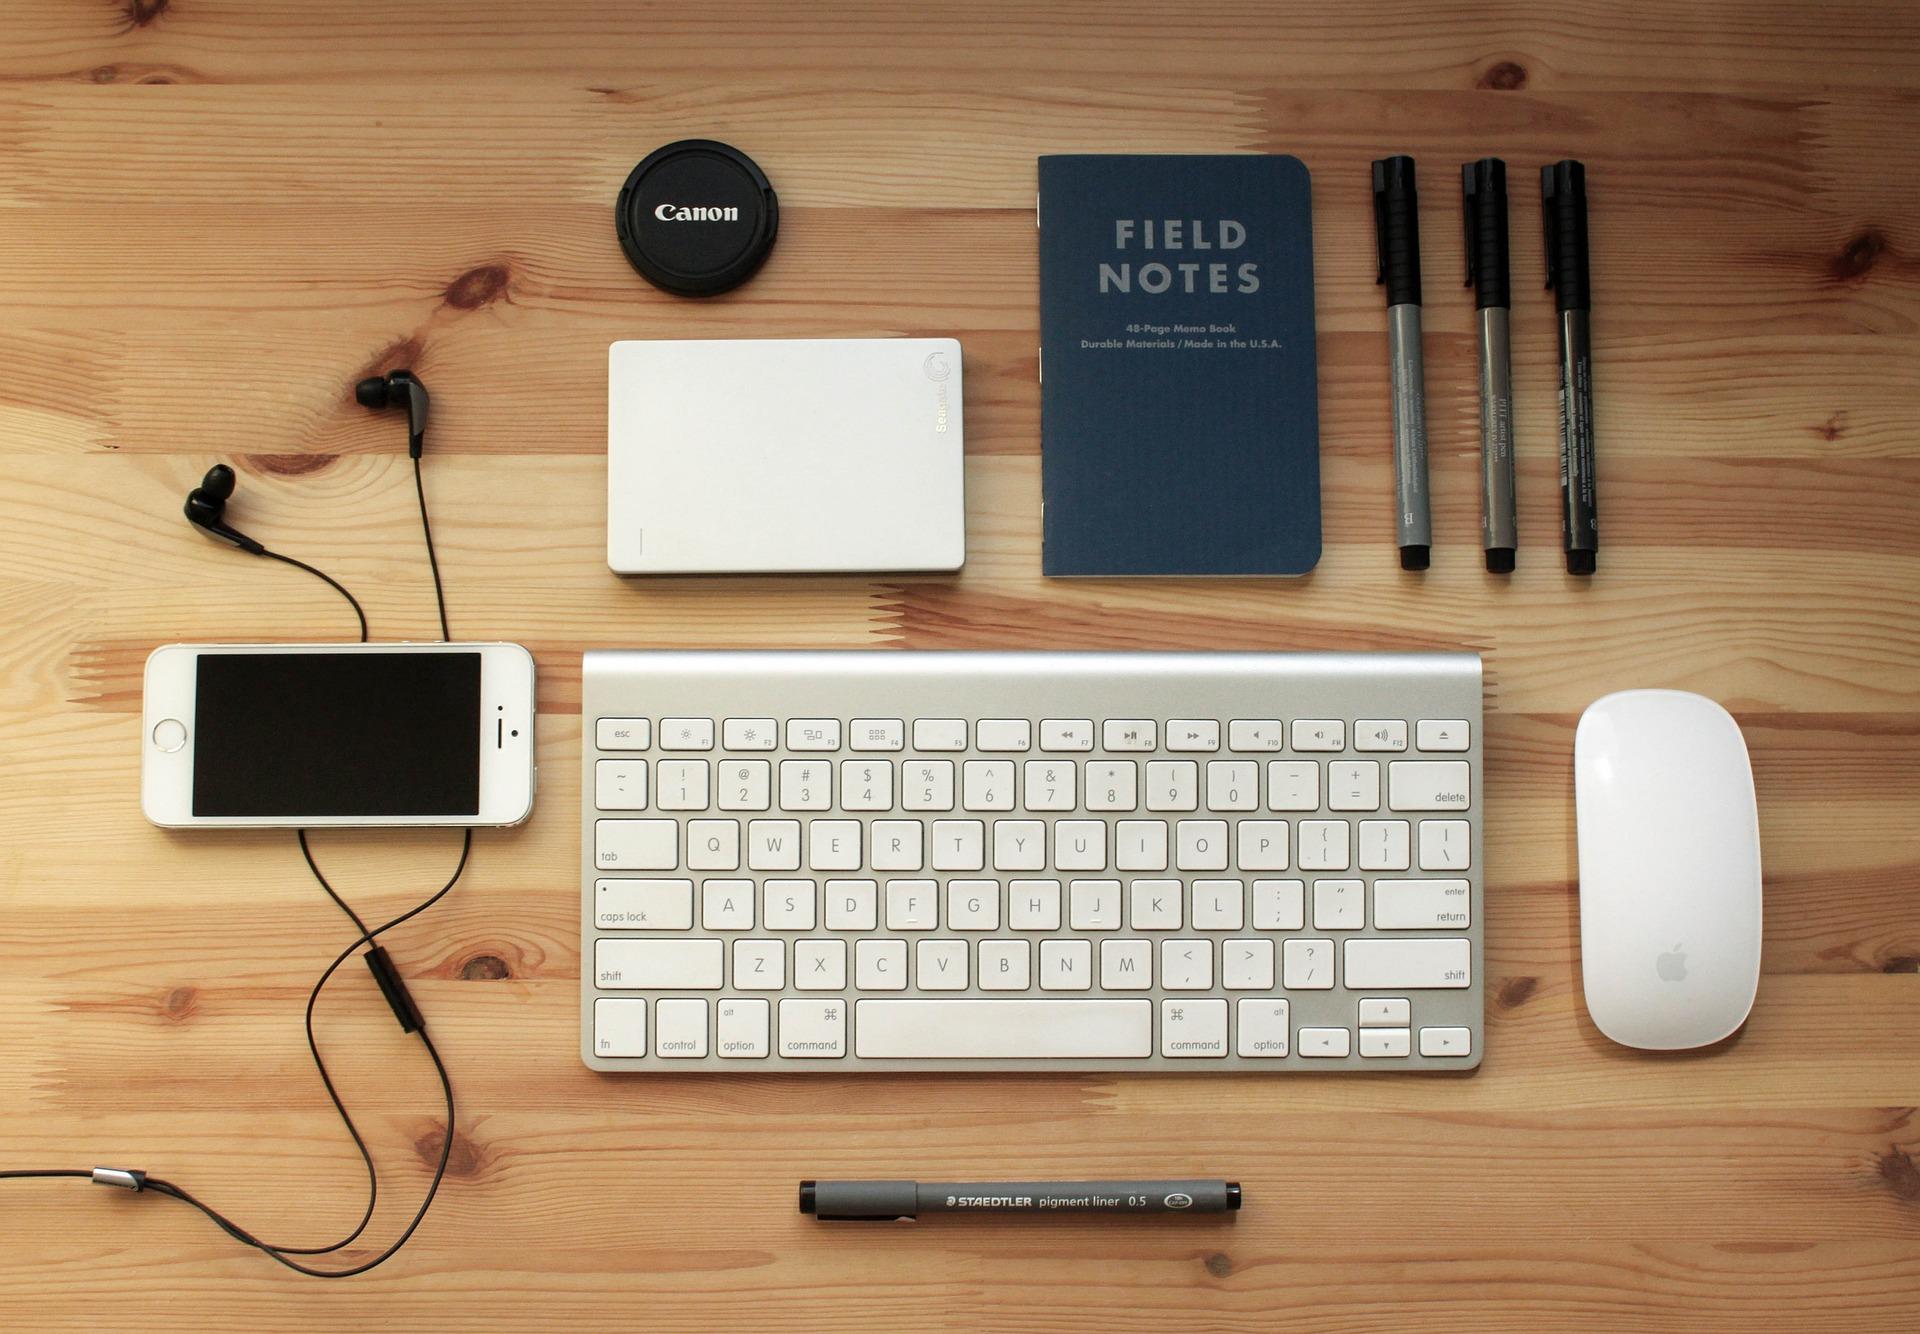 Gadget aziendali: quali sono i vantaggi per chi li usa?